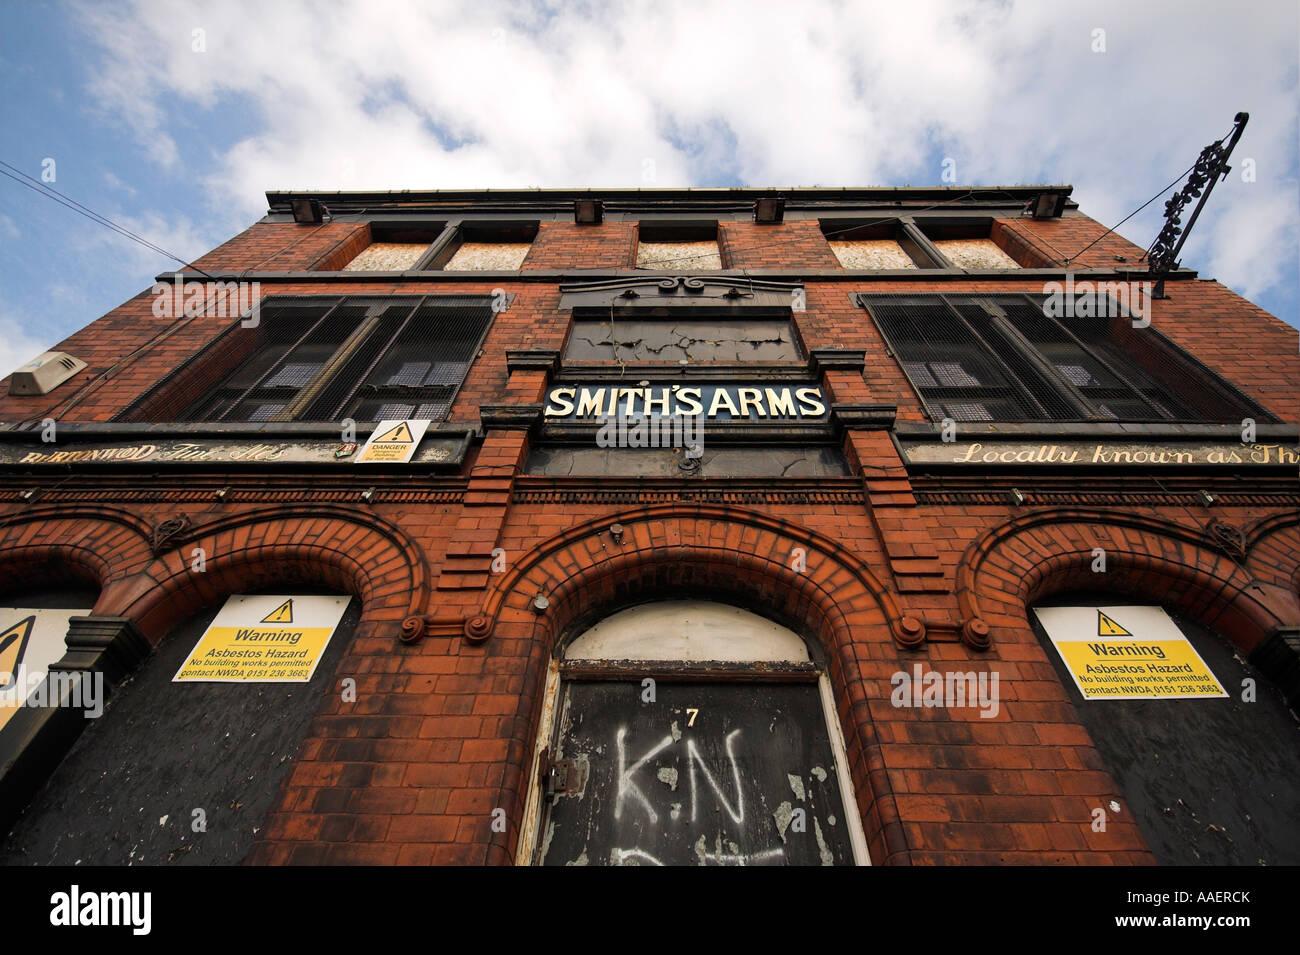 Derelict pub, Smiths Arms public house, Sherratt Street, Ancoats, Manchester, UK - Stock Image